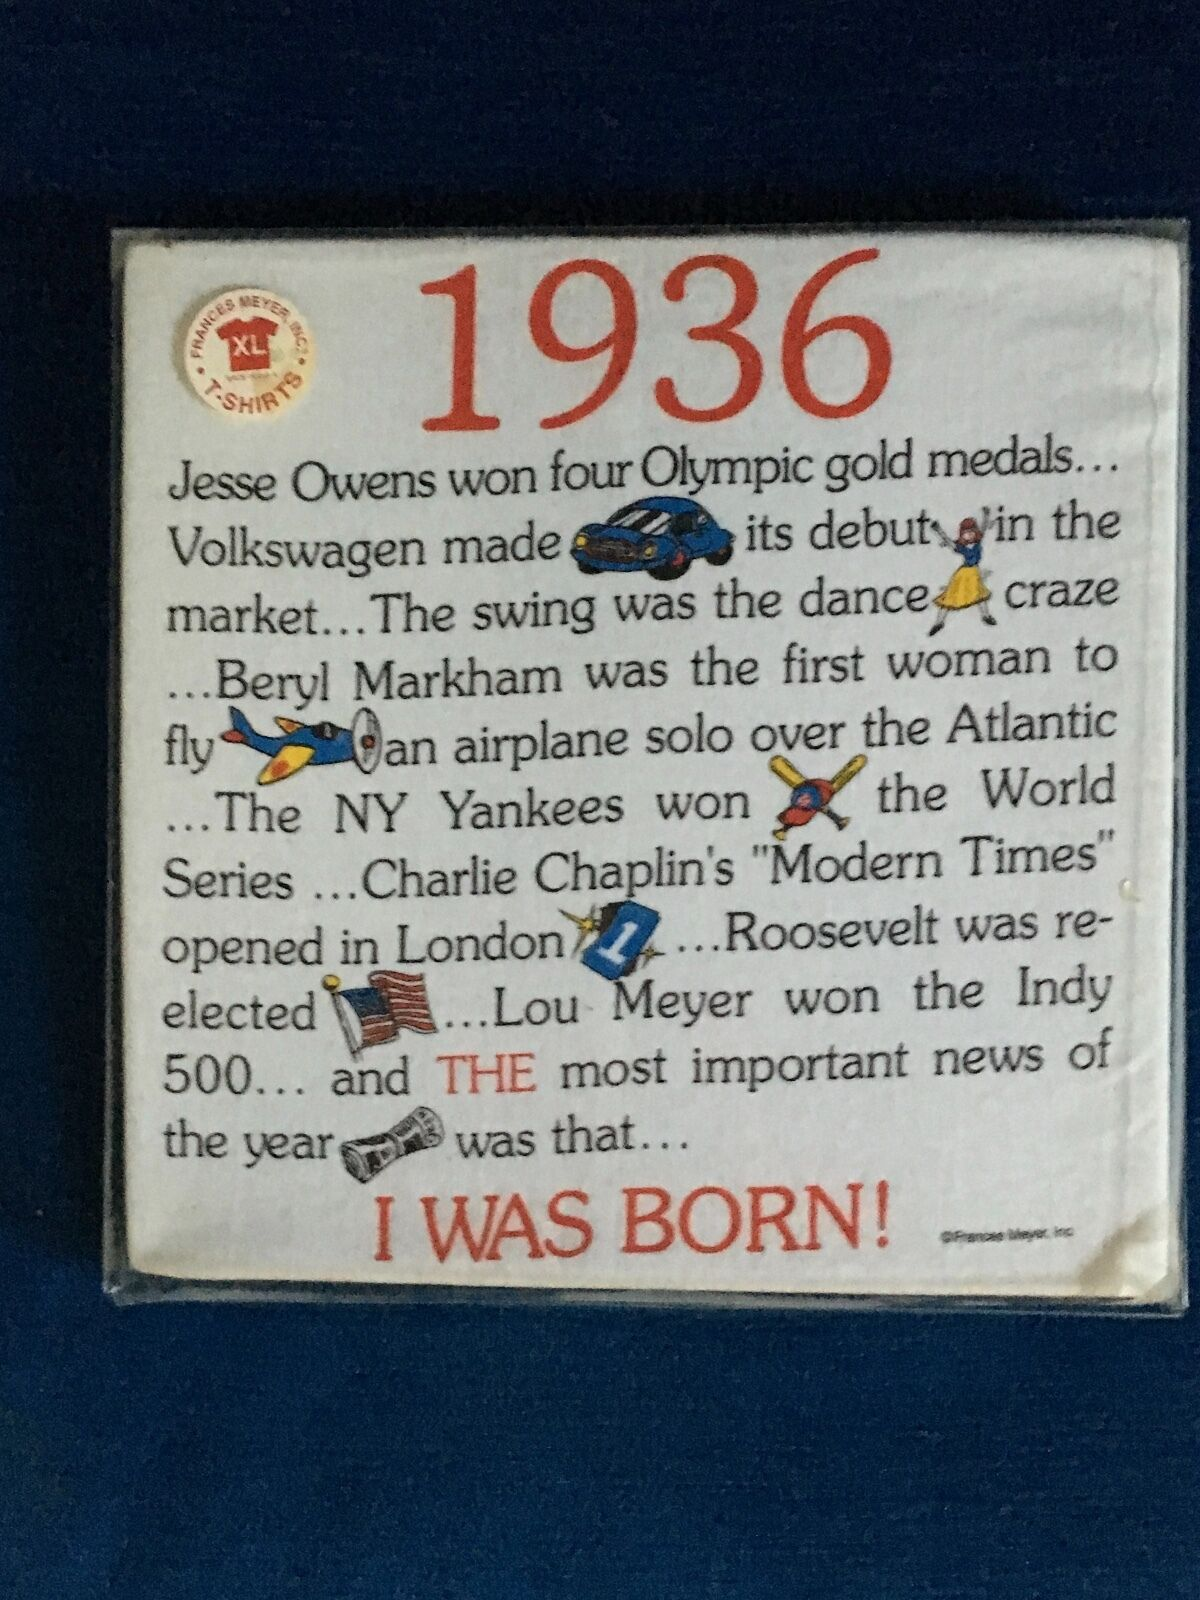 84th FUN Birthday Gift Tee Shirt for People born in 1936-New